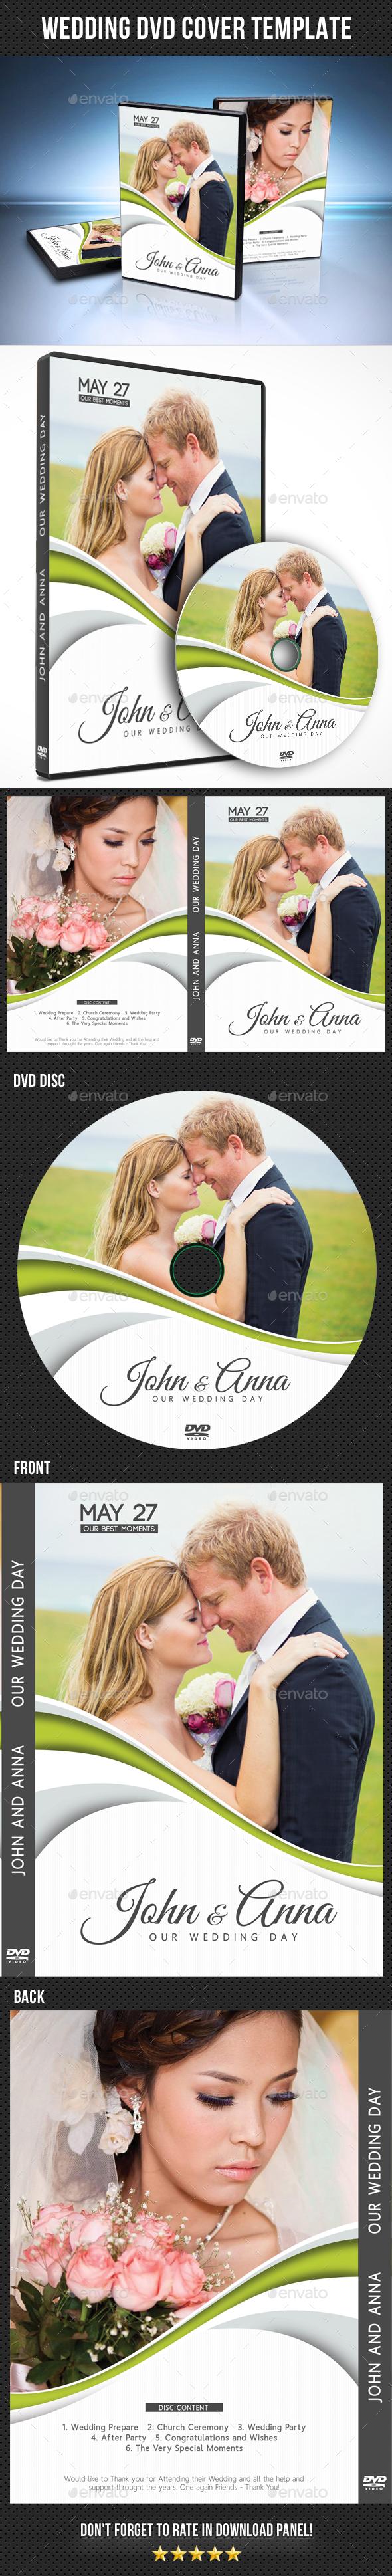 Wedding DVD Cover Template 19 - CD & DVD Artwork Print Templates